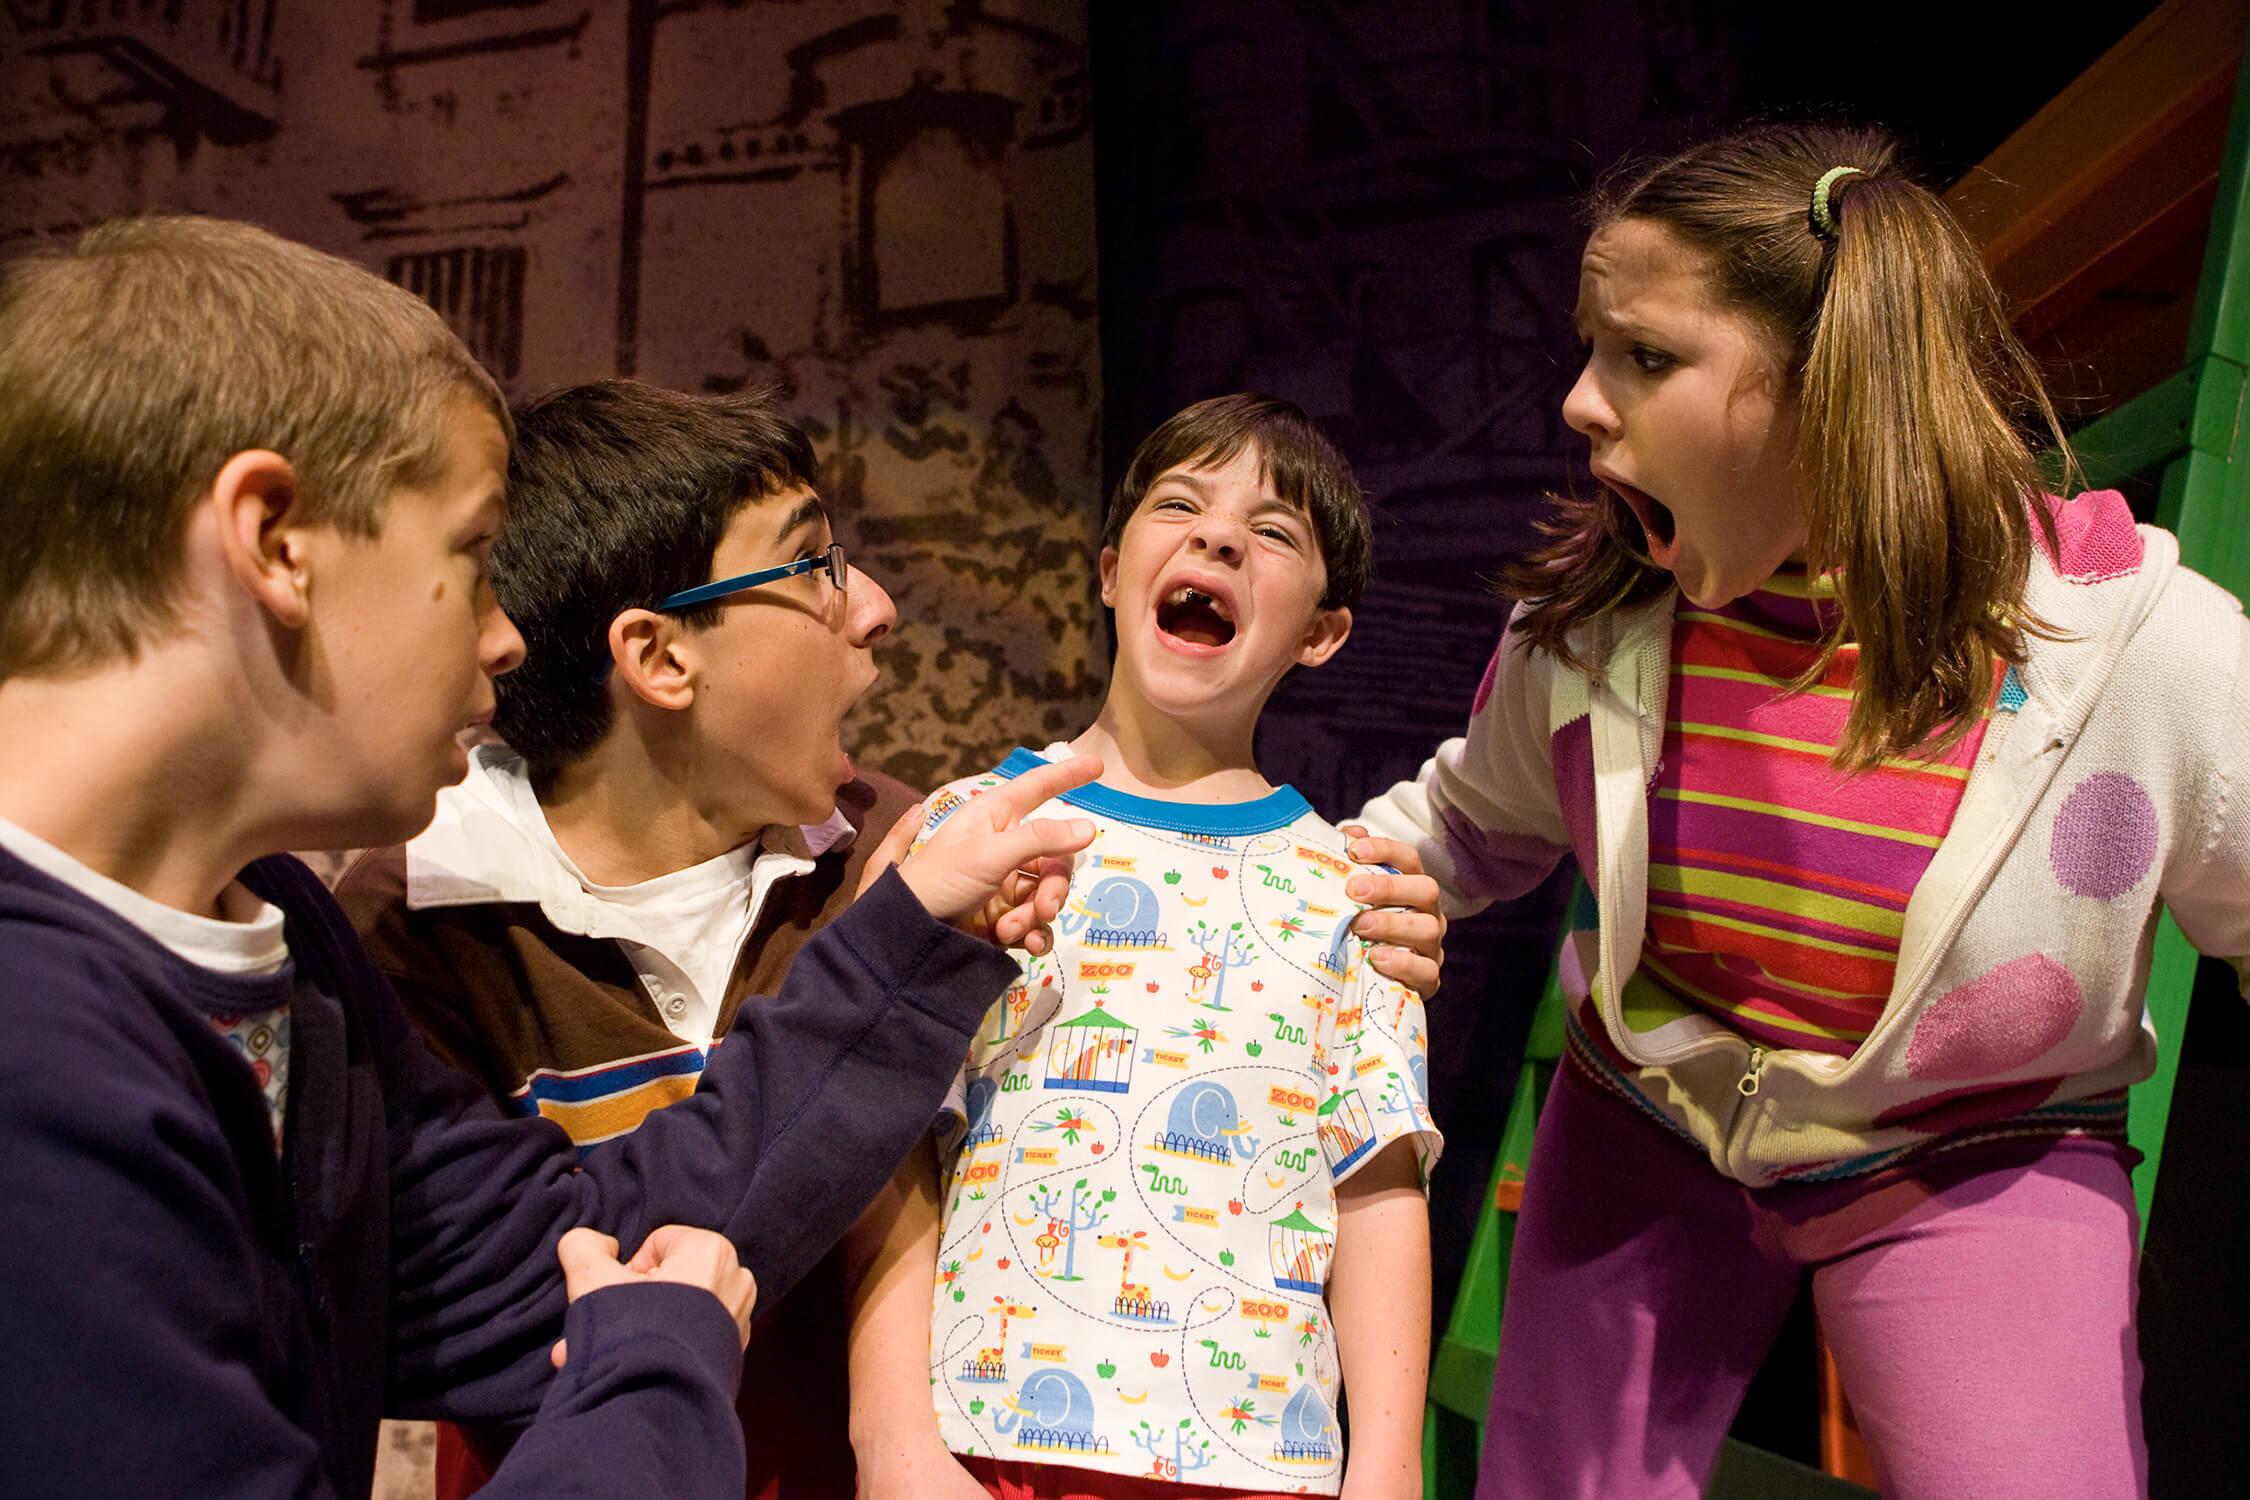 Oregon Children's Theatre